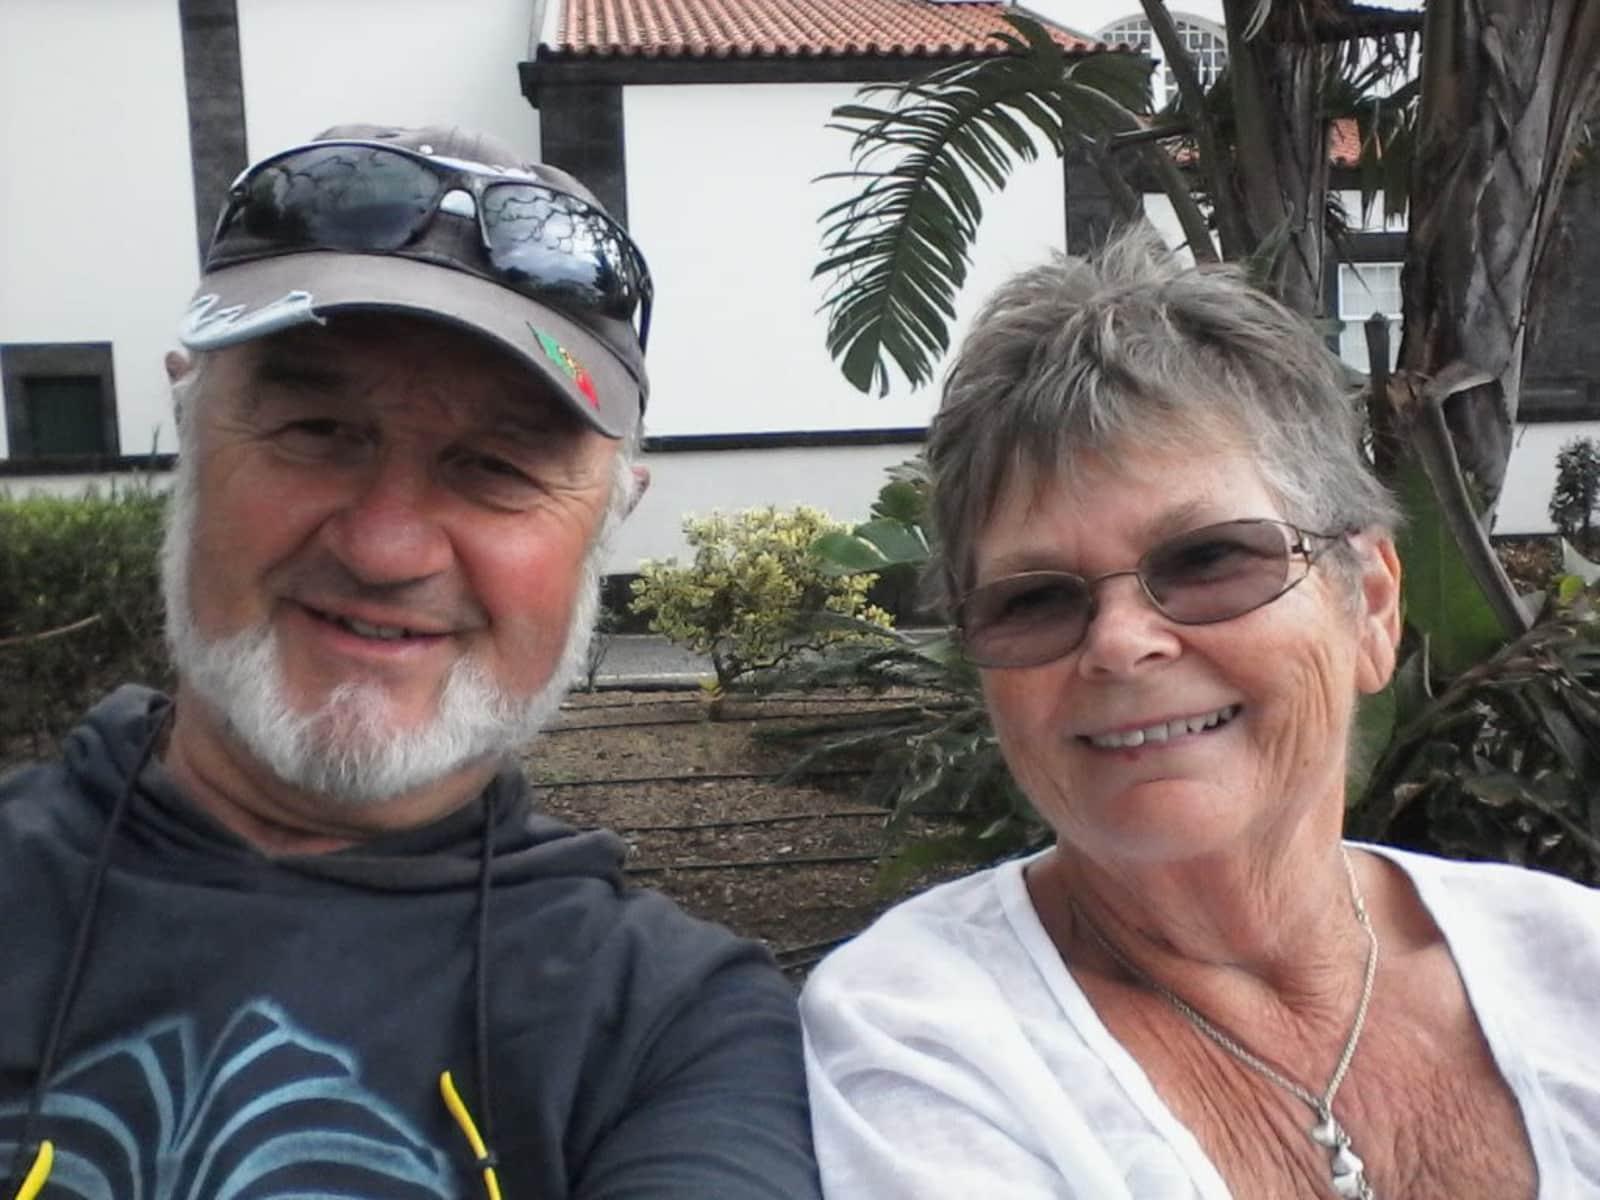 King & Linda from Tauranga, New Zealand